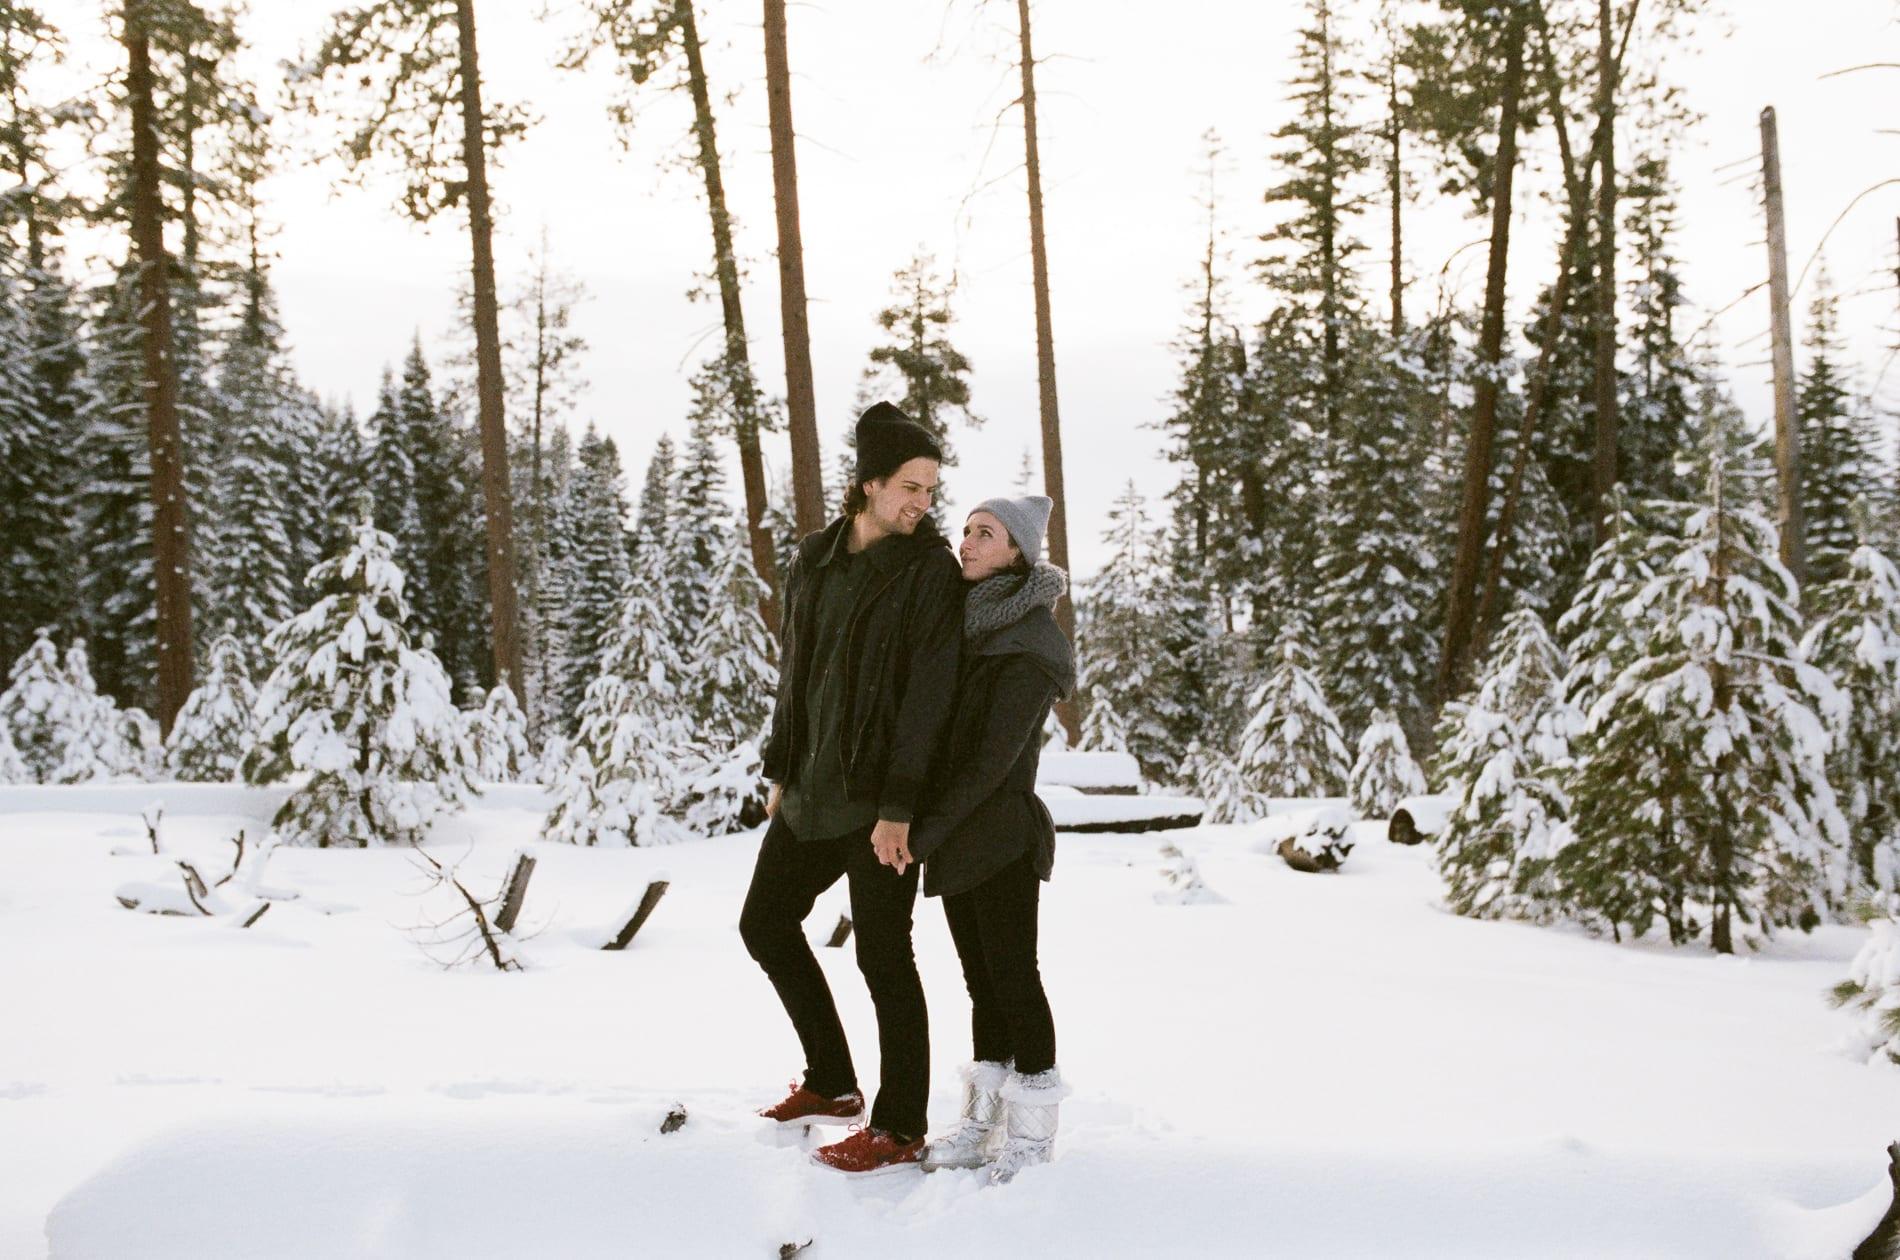 mt-lassen-winter-snow-couples-photo-11